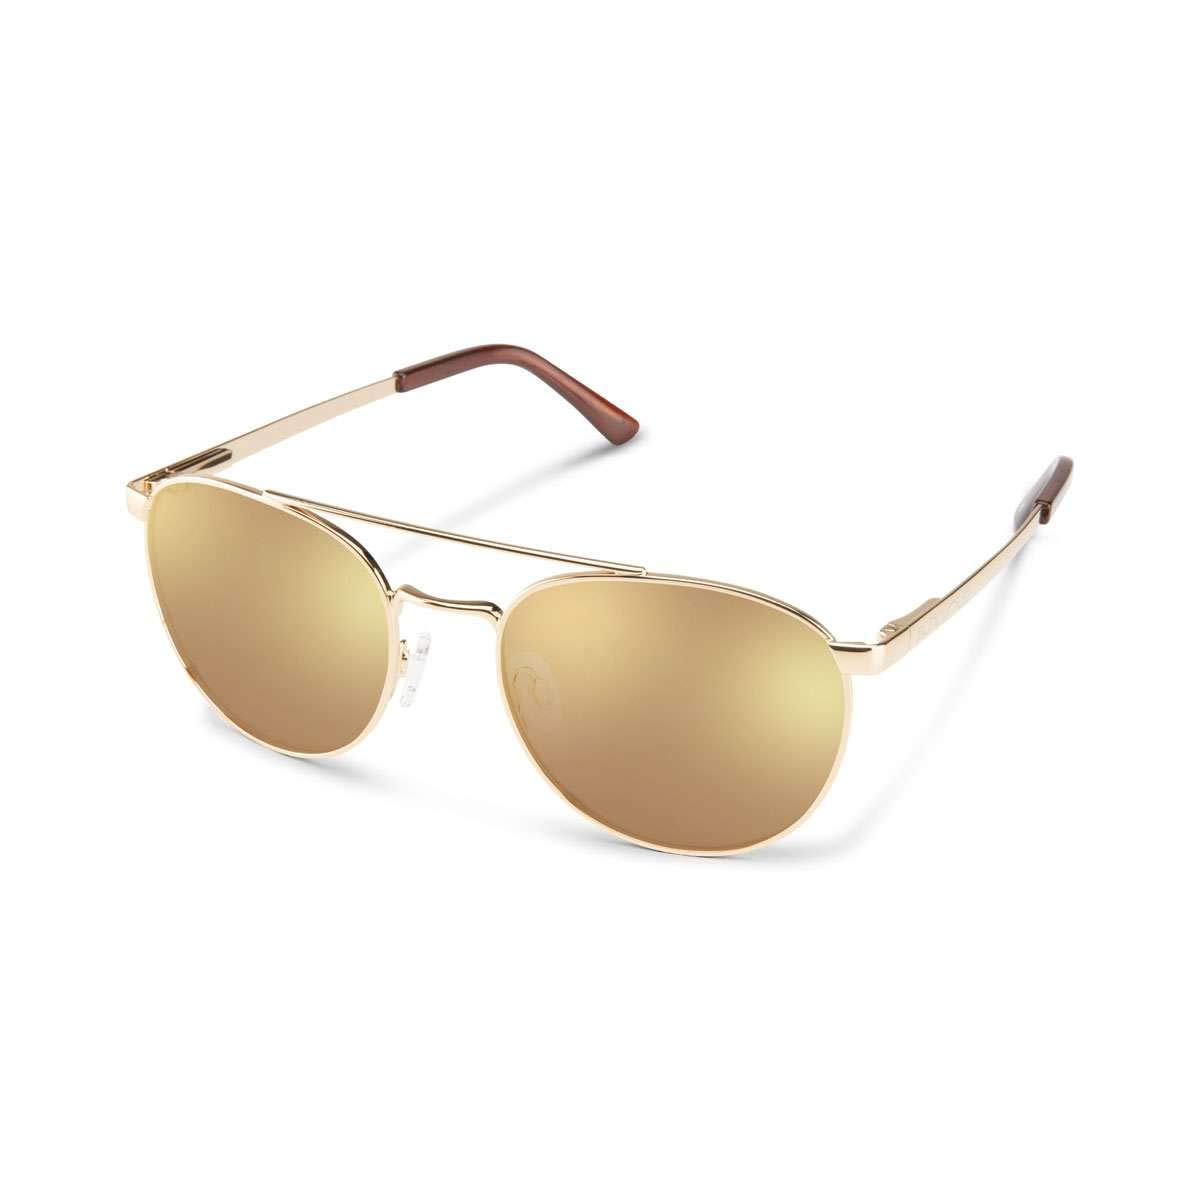 Suncloud Motorist Polarized Sunglasses by Polaroid 54mm